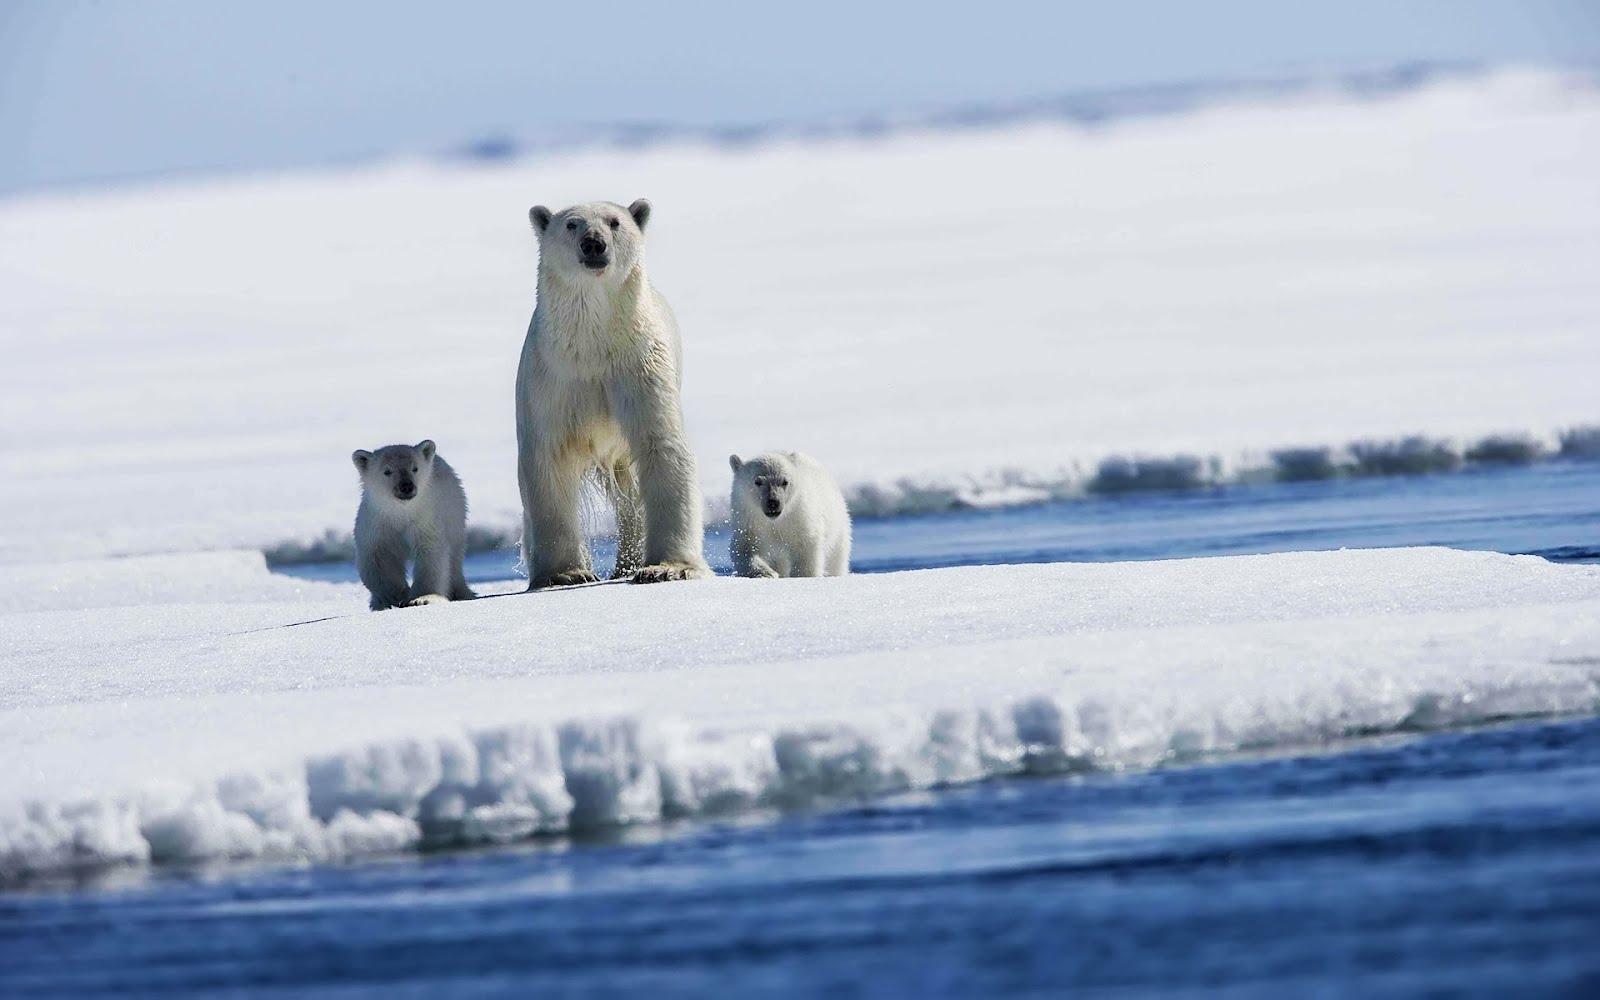 Bonito fondo para tu pc o laptop de osos polares en la nieve